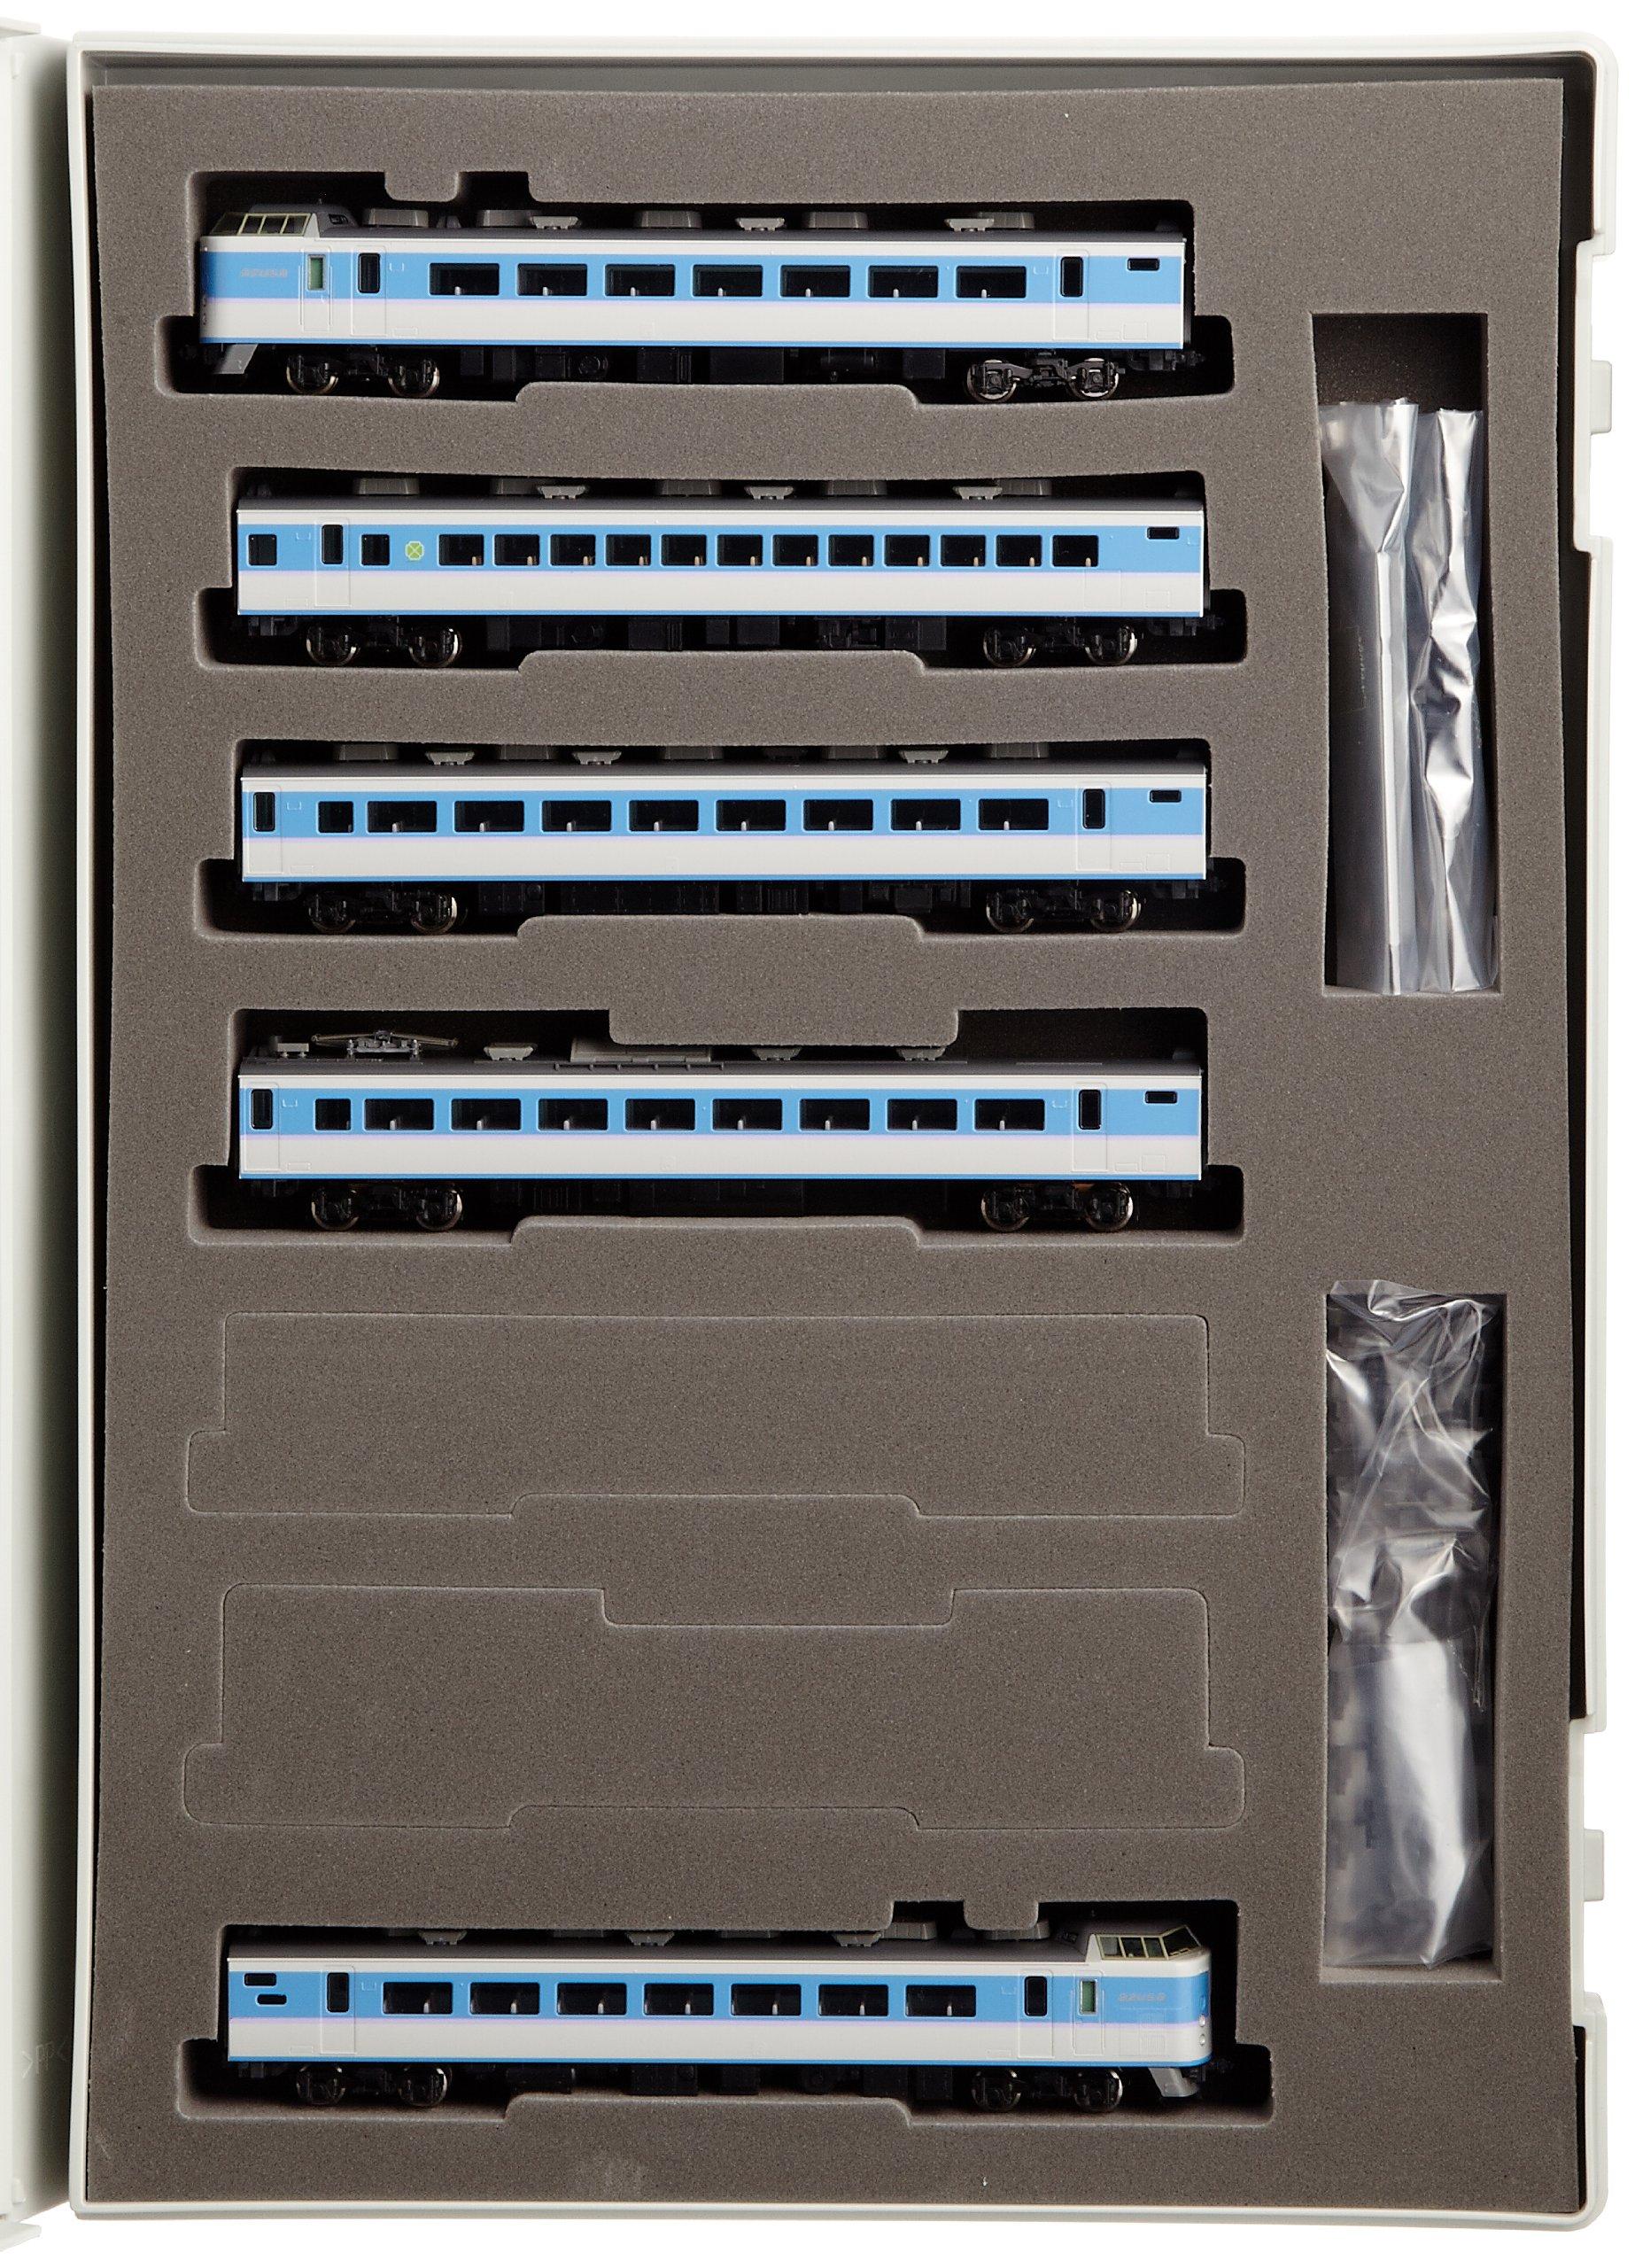 J.R. Limited Express Train Series 183-1000 [Azusa] (Basic 5-Car Set) (Model Train) (japan import)